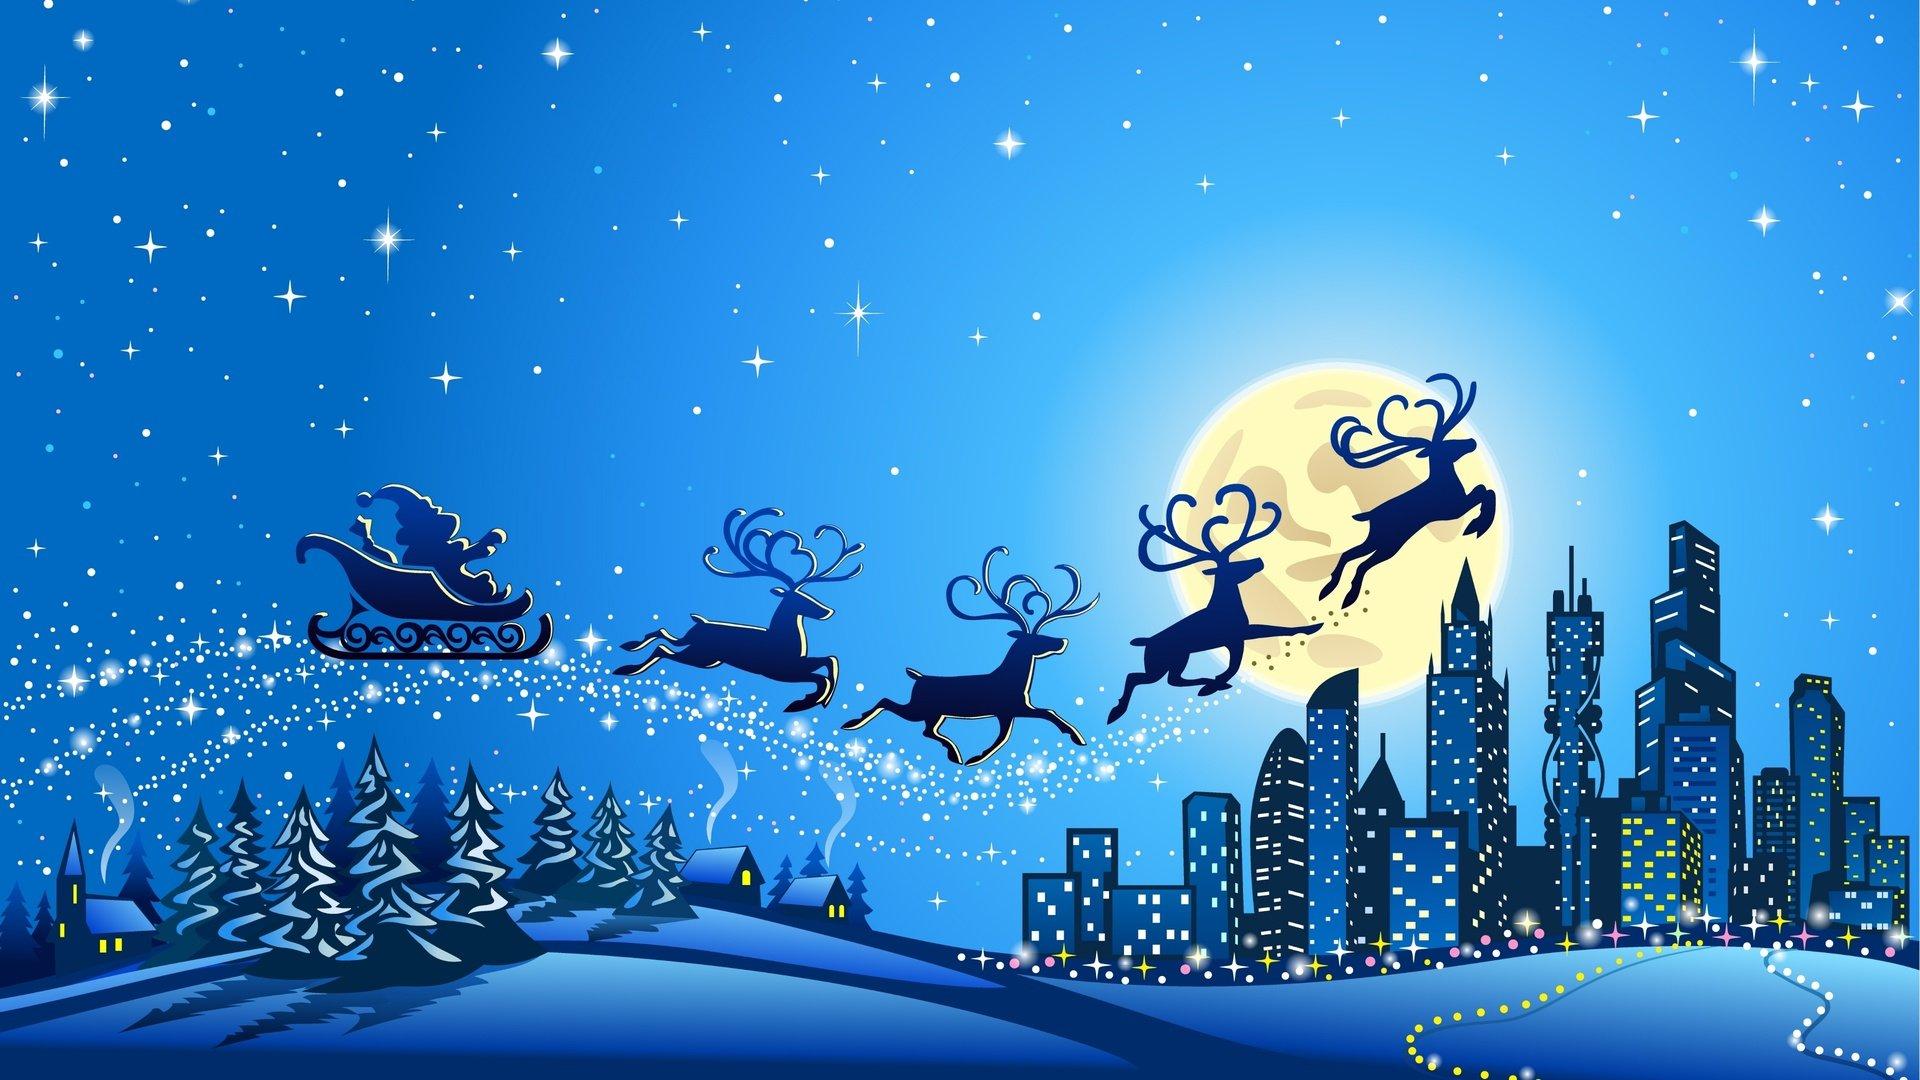 download New Year Merry Christmas 4K Ultra HD wallpaper 4k 1920x1080